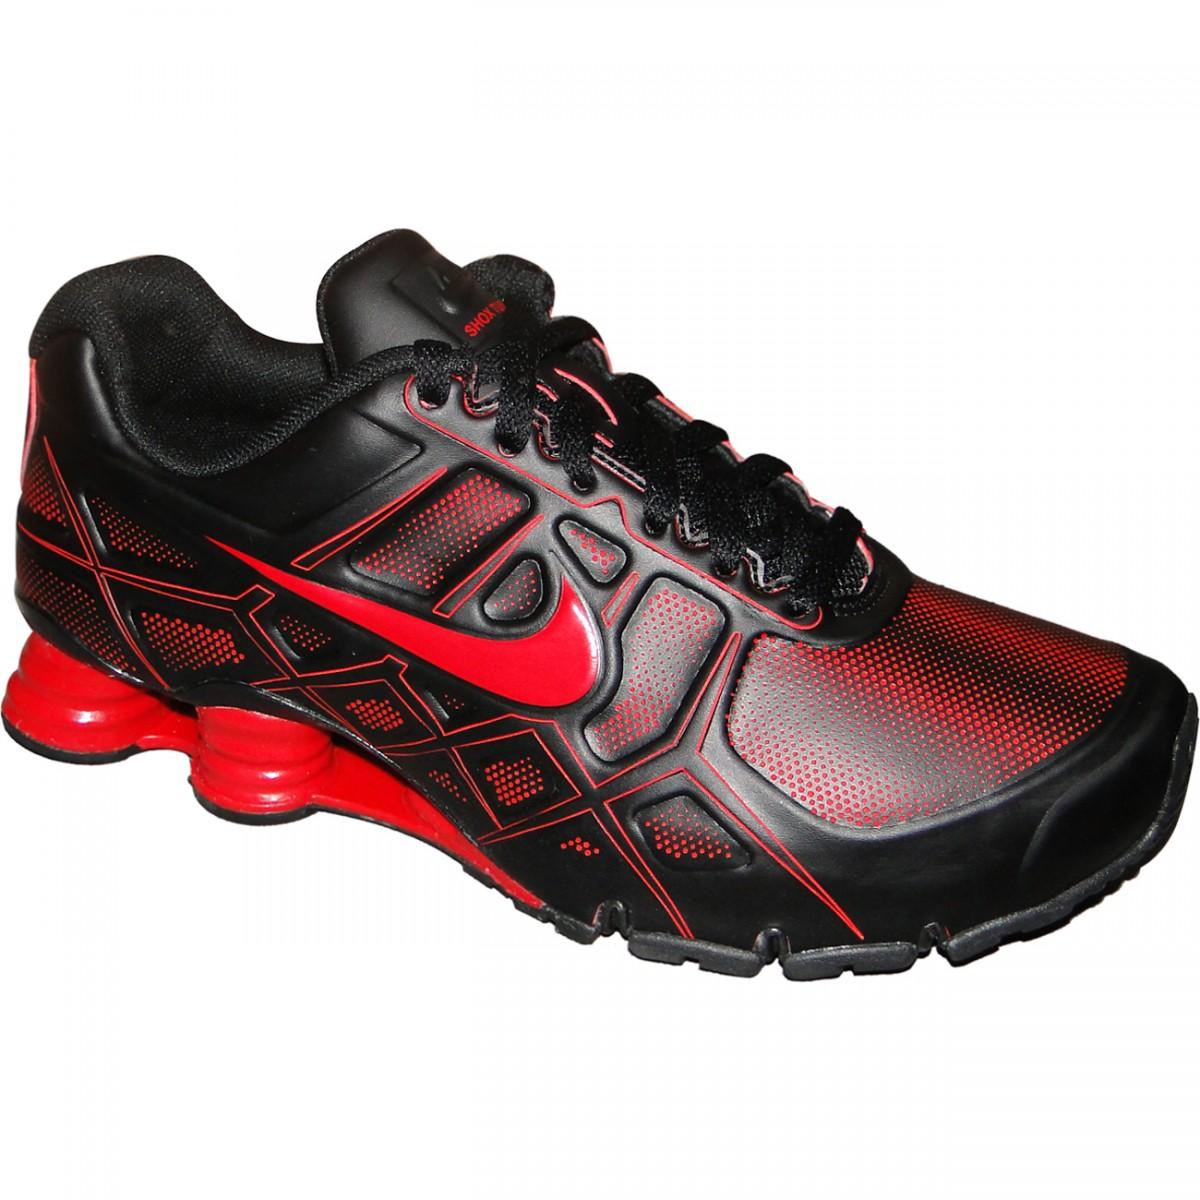 c1581d633d7 Tênis Nike Shox Turbo Xii 8322 - PRETO VERMELHO - Chuteira Nike ...